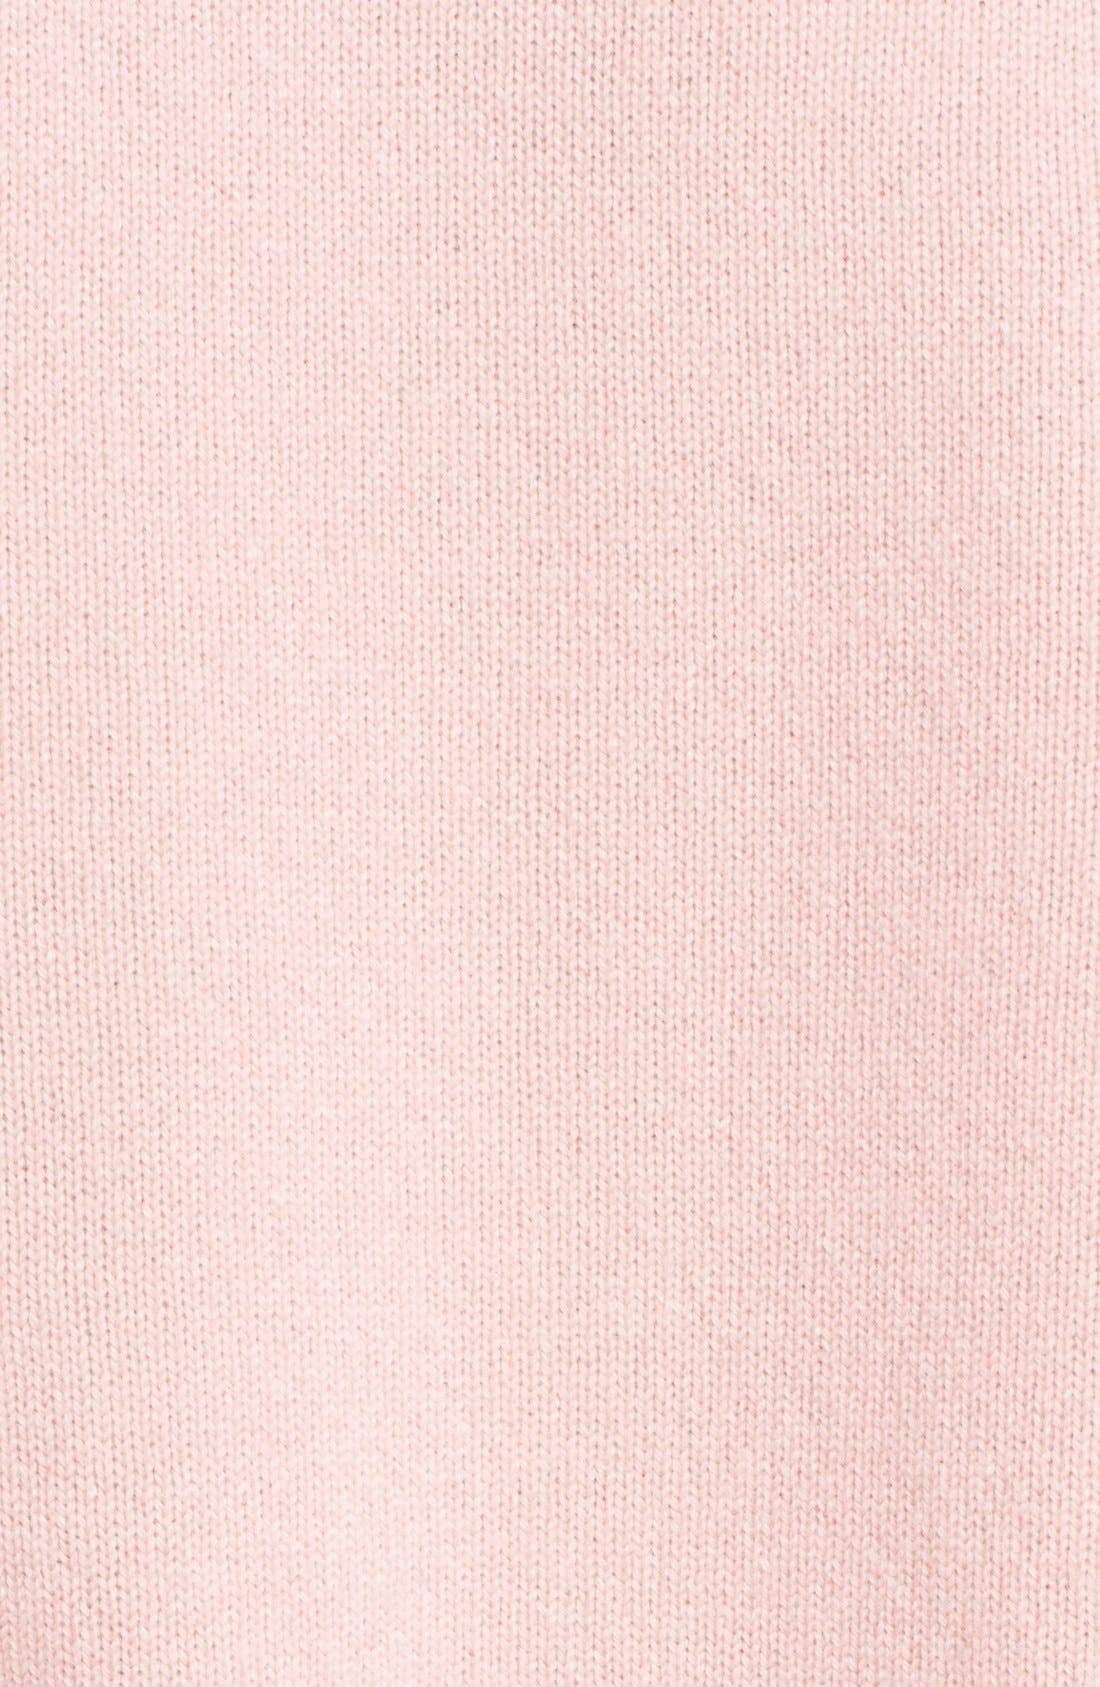 Alternate Image 3  - Tomas Maier Cashmere Turtleneck Sweater